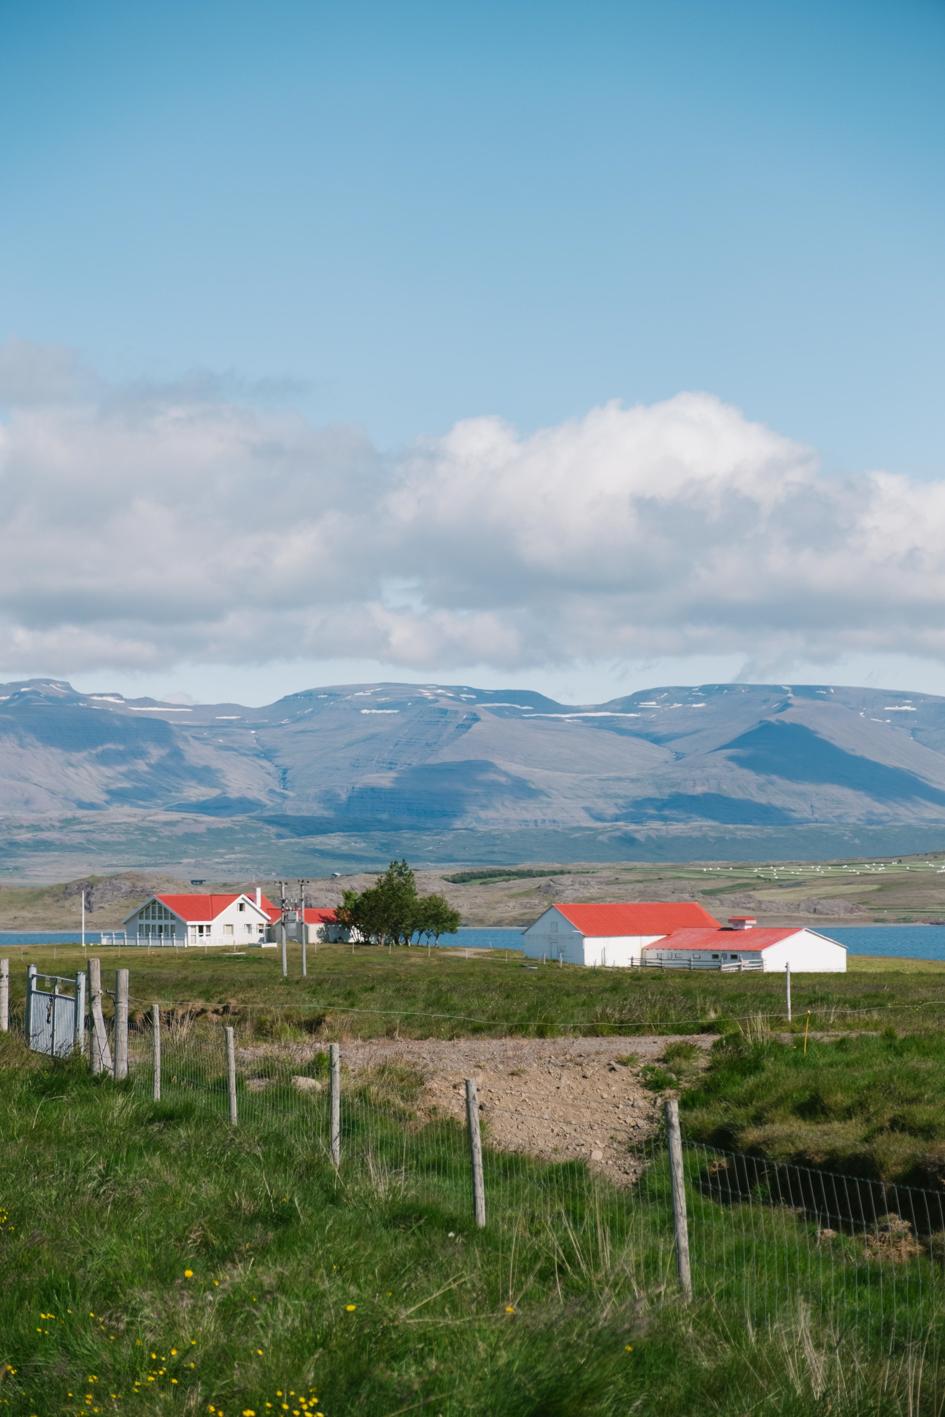 ICELAND - VIA TOLILA